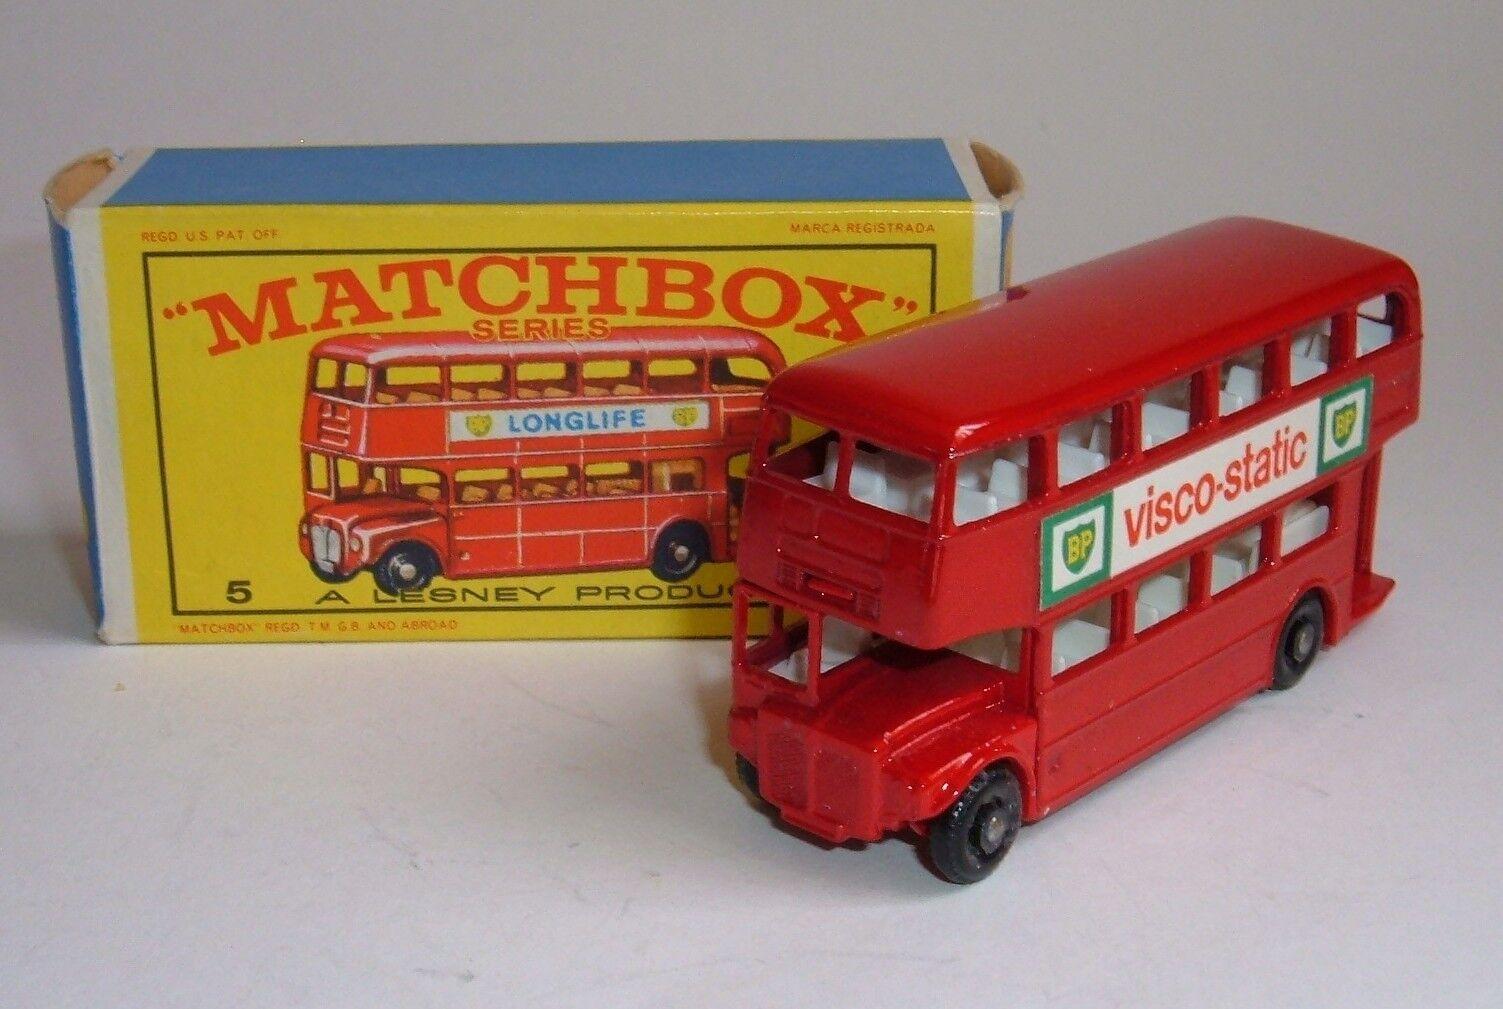 Matchbox Series No. 5, London Bus, - Superb Mint.